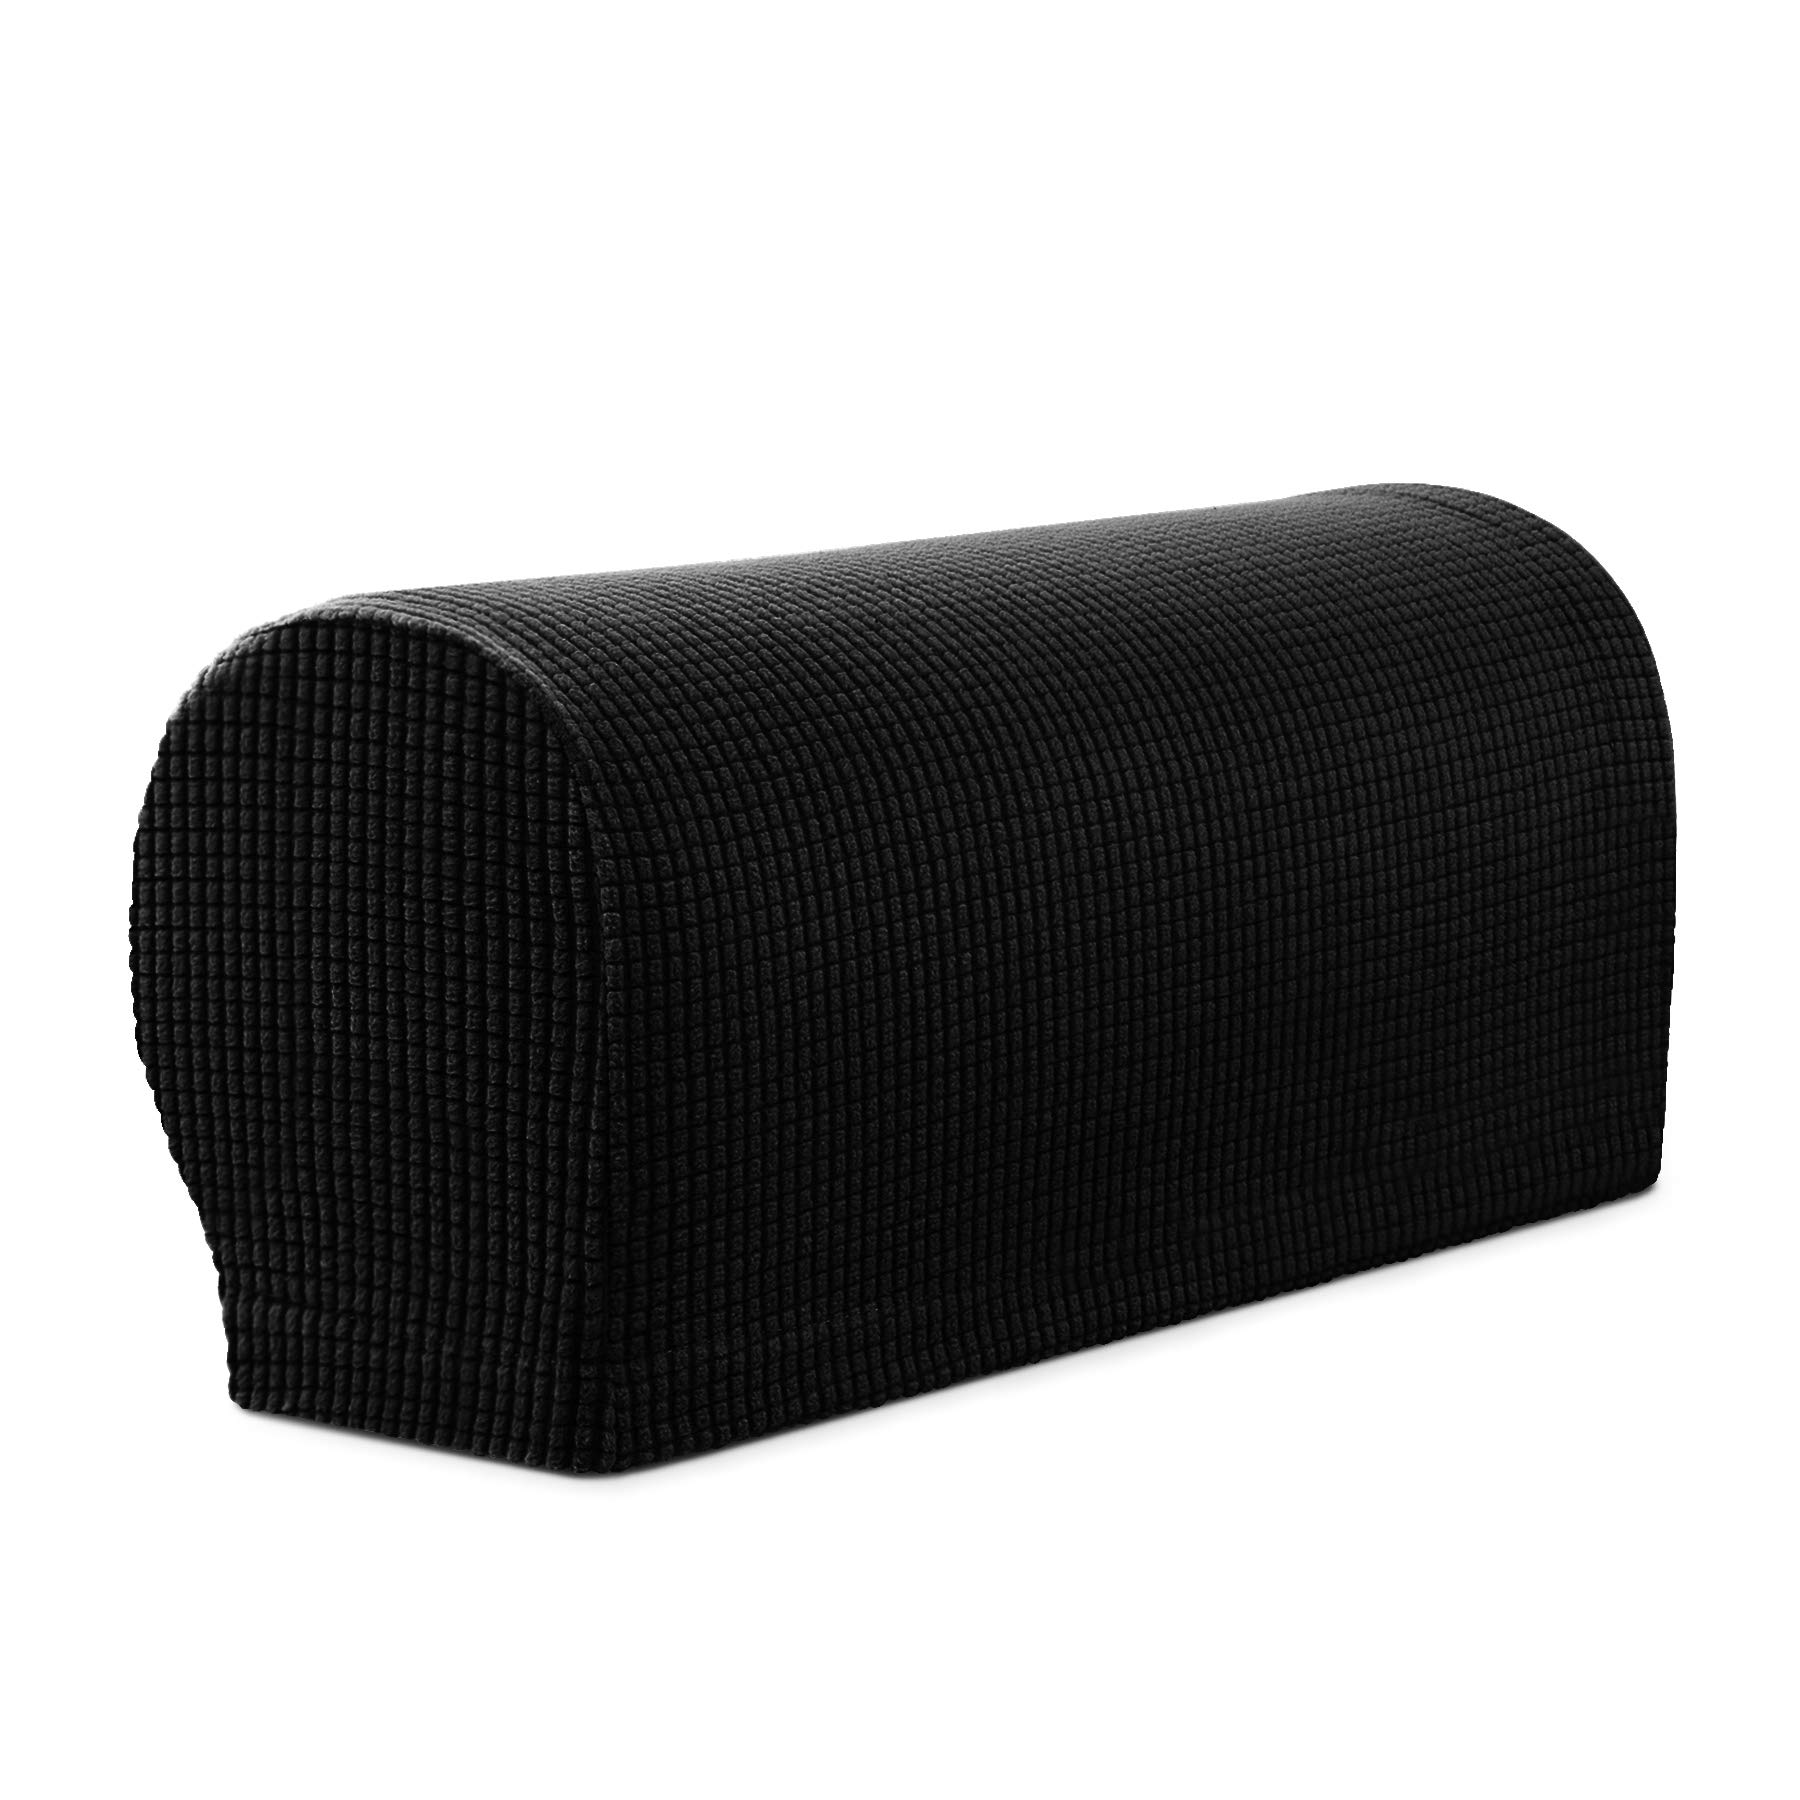 Subrtex Spandex Stretch Armrest Covers Set of 2 (Black)